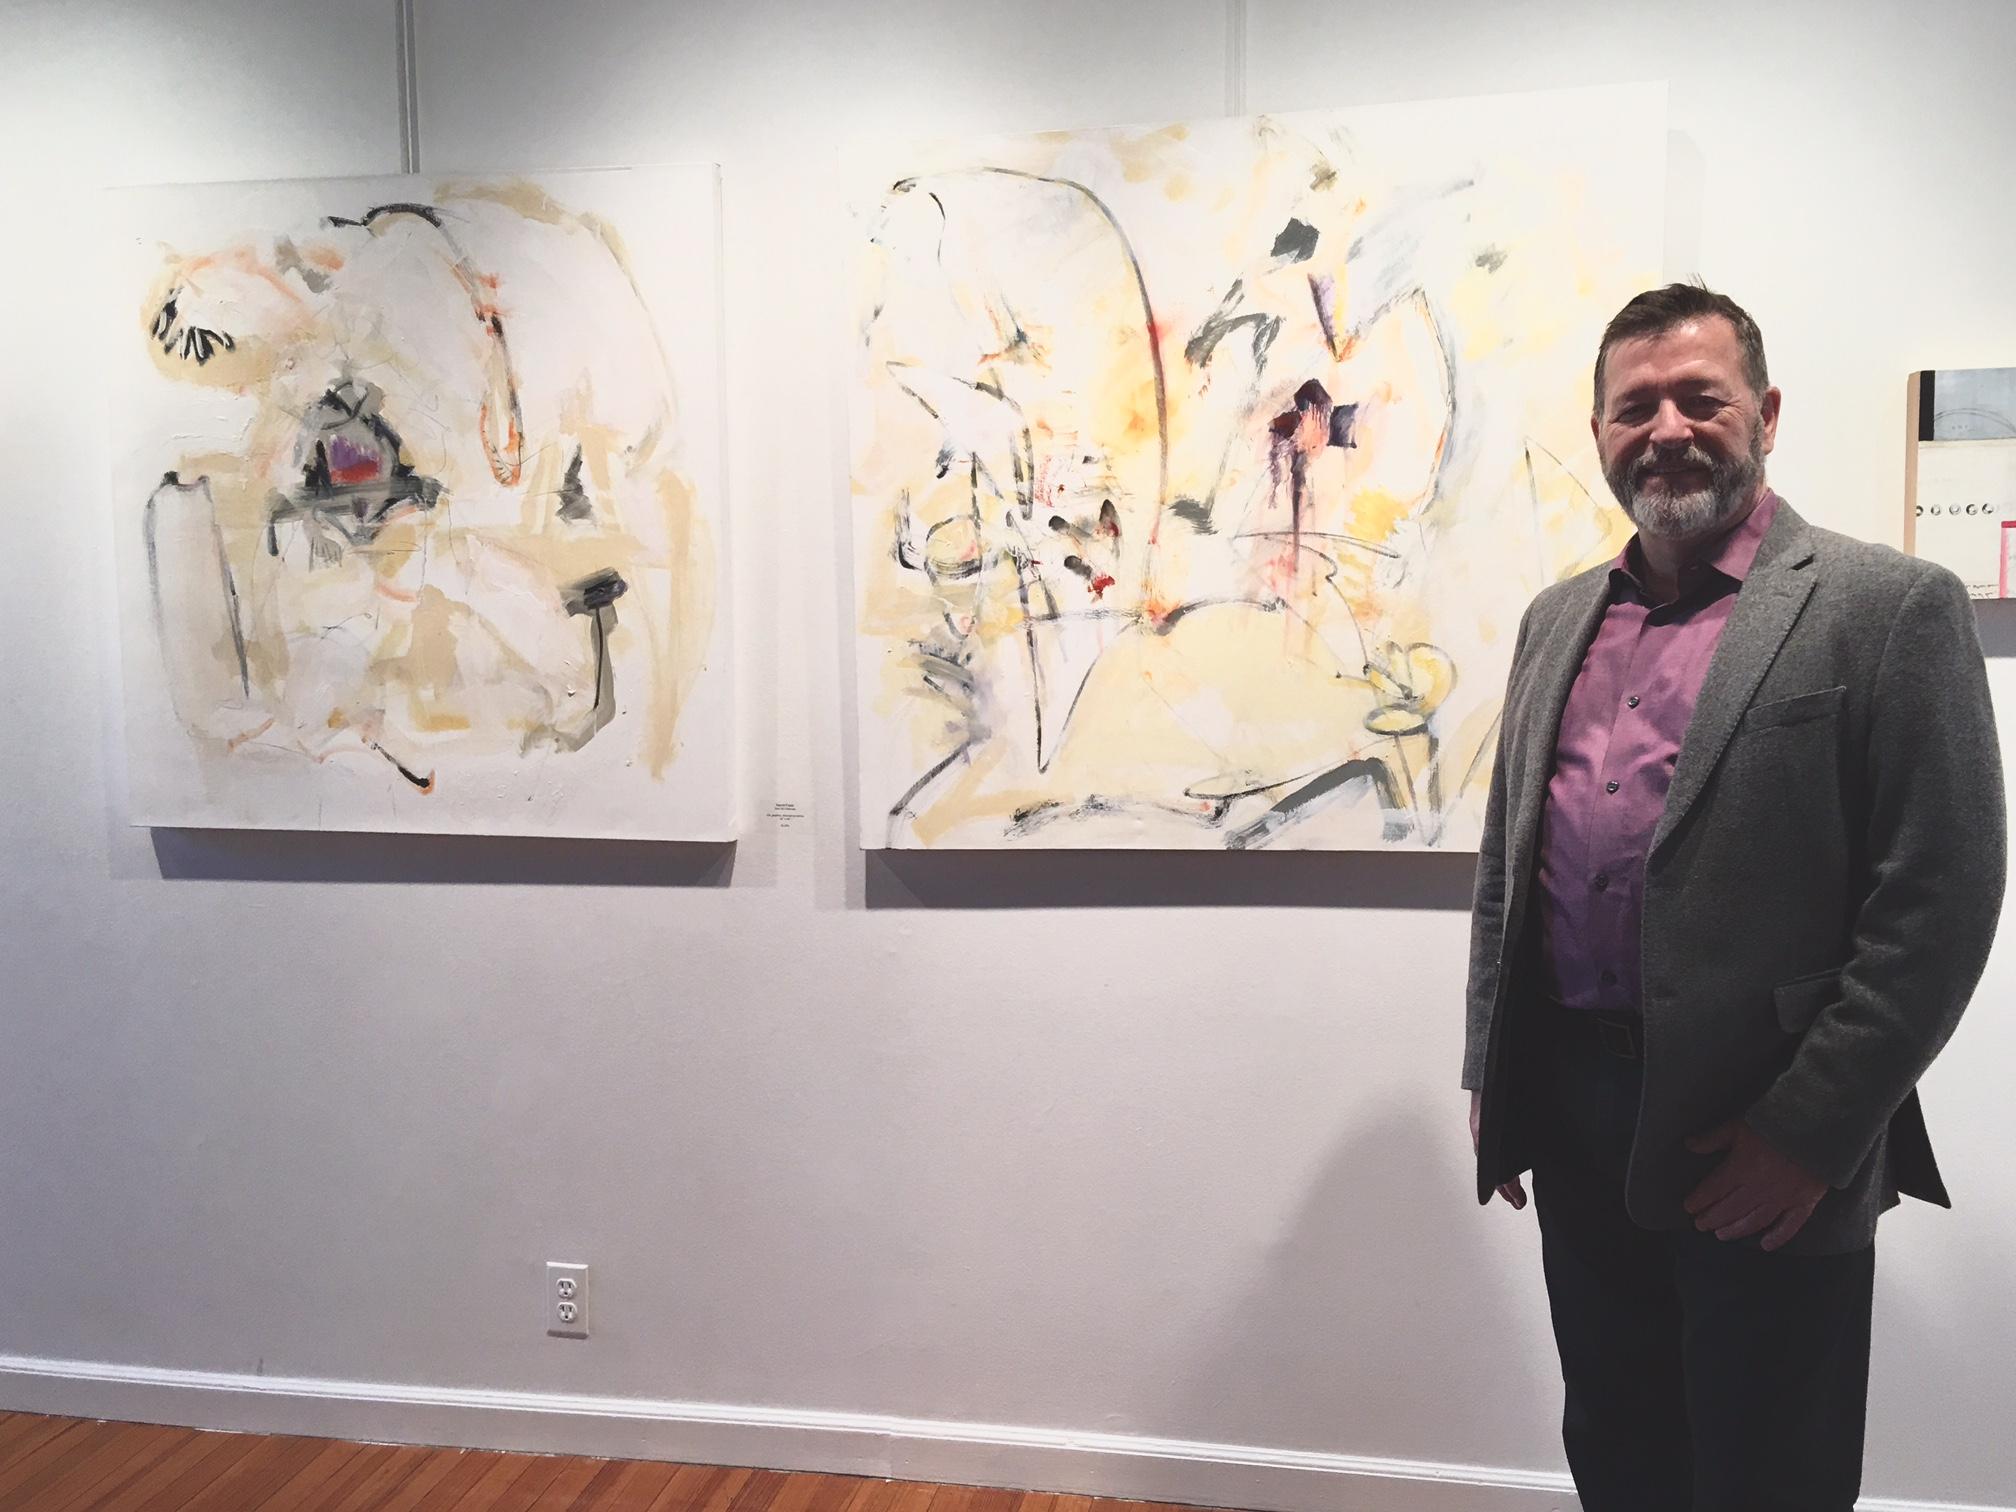 Paul XO Pinkman with Sacré-Cœur  and Golgatha on exhibit, 2017